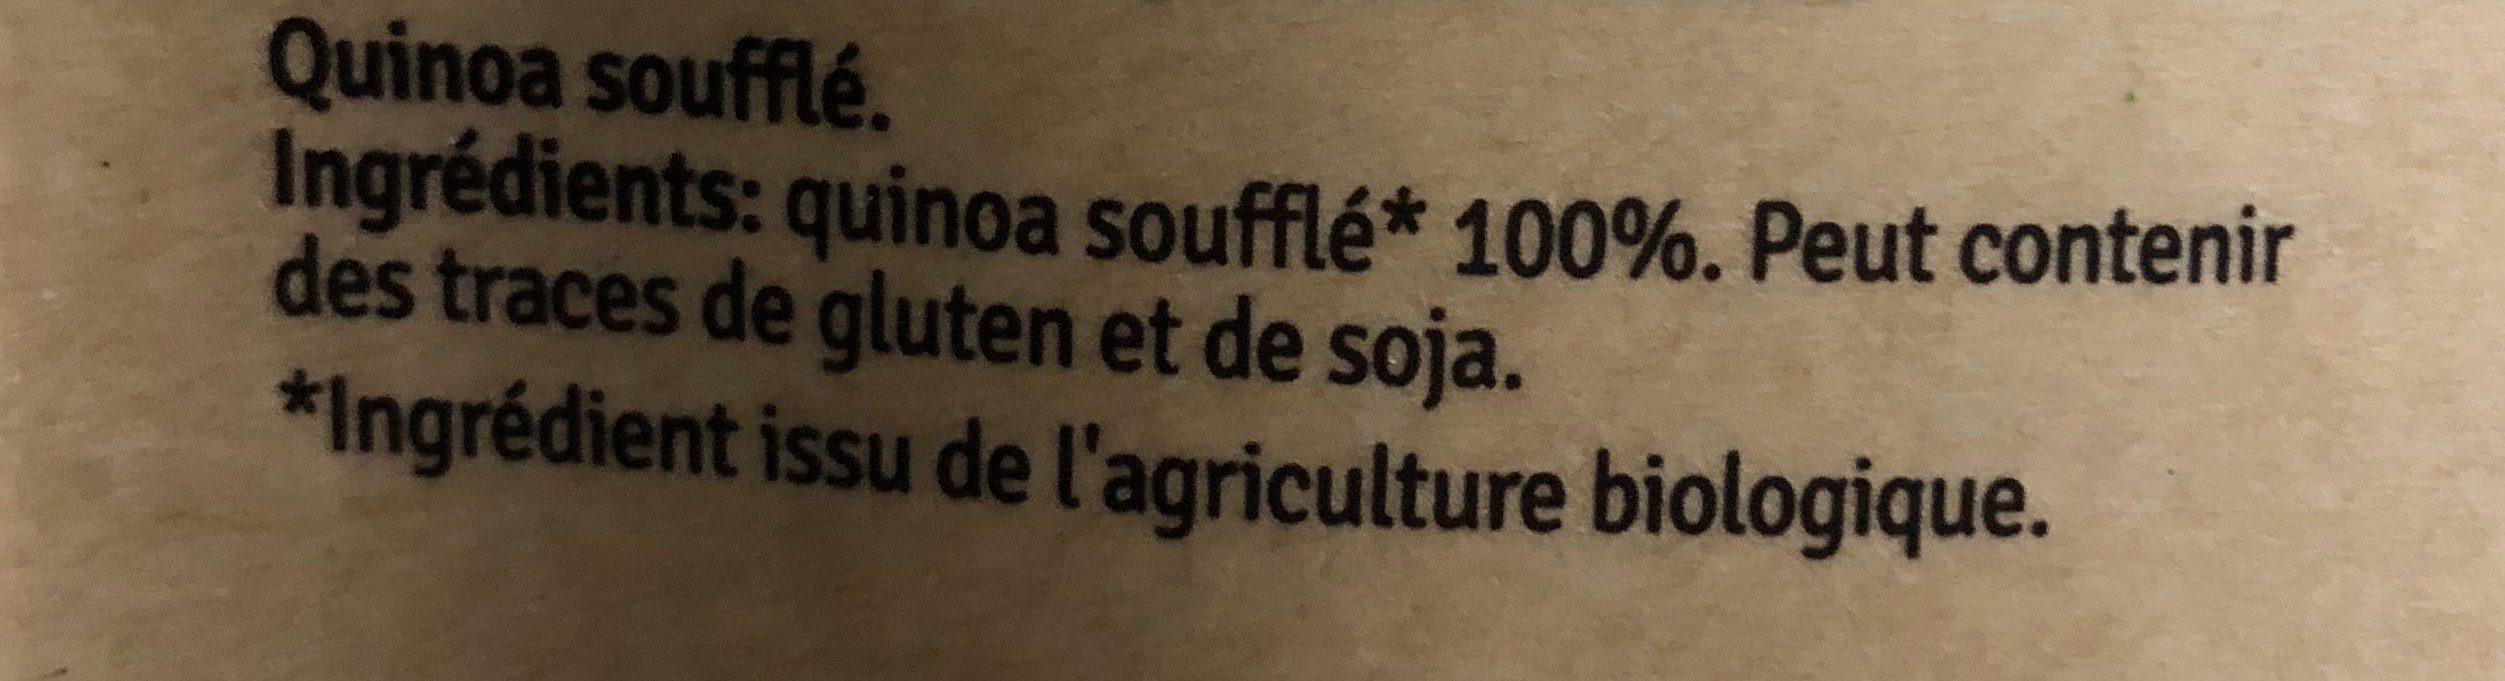 Quinoa soufflé - Ingredients